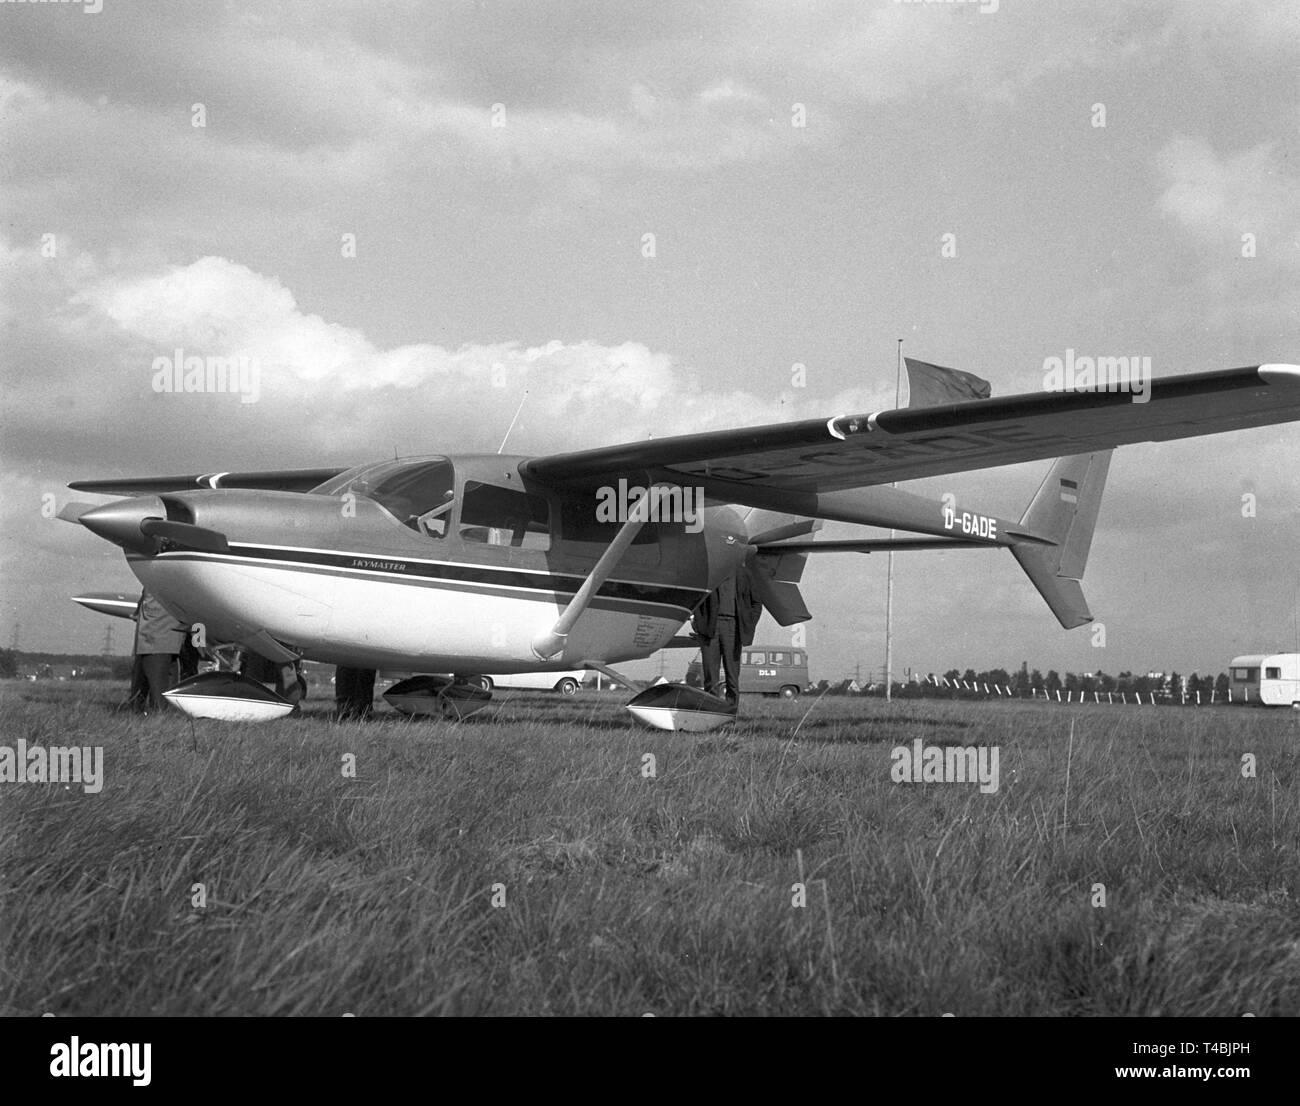 Skymaster Stock Photos & Skymaster Stock Images - Alamy